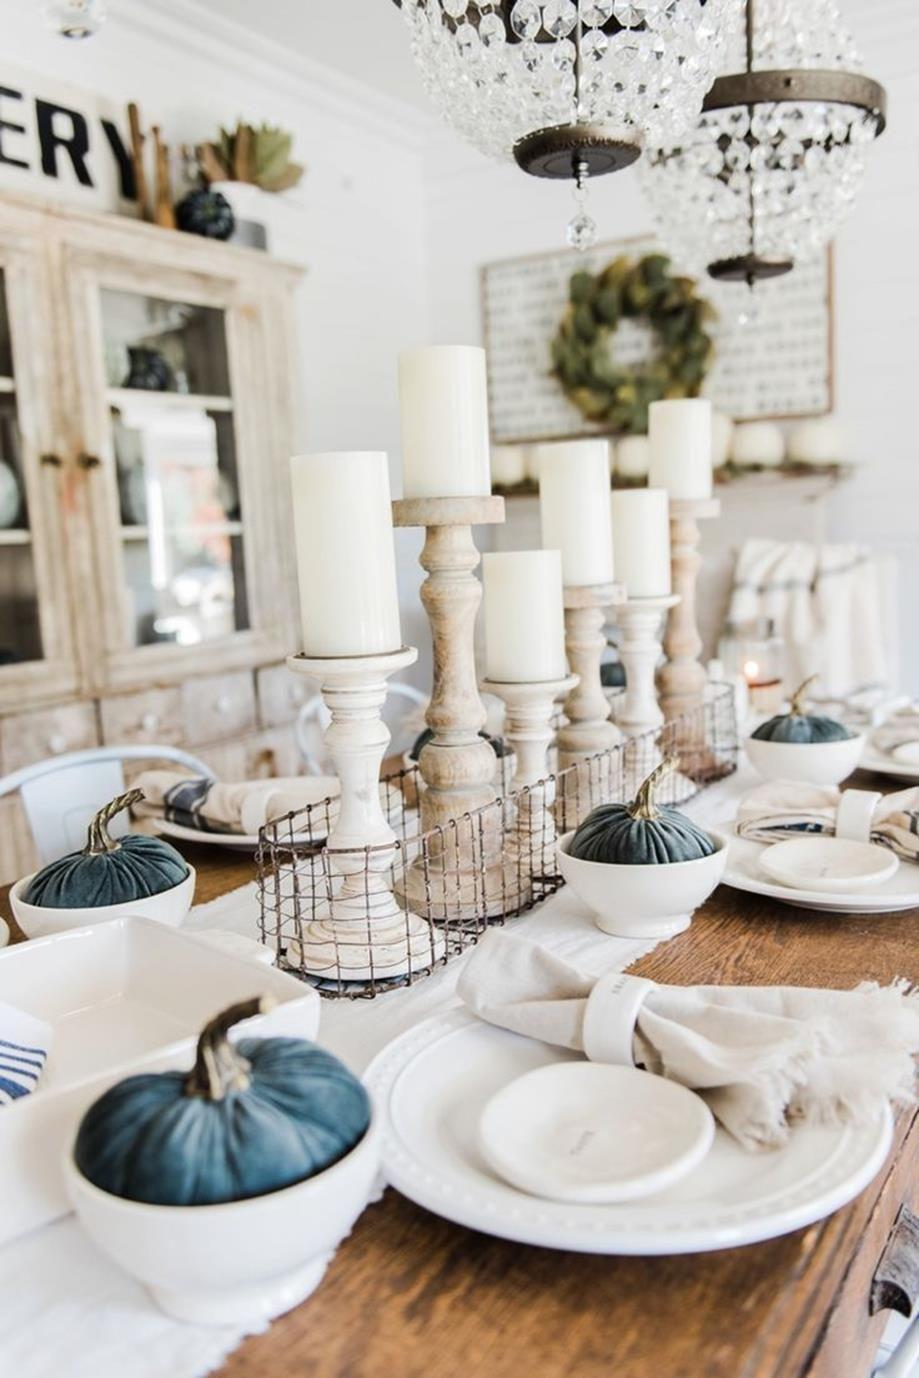 43 rustic farmhouse decor table centerpieces